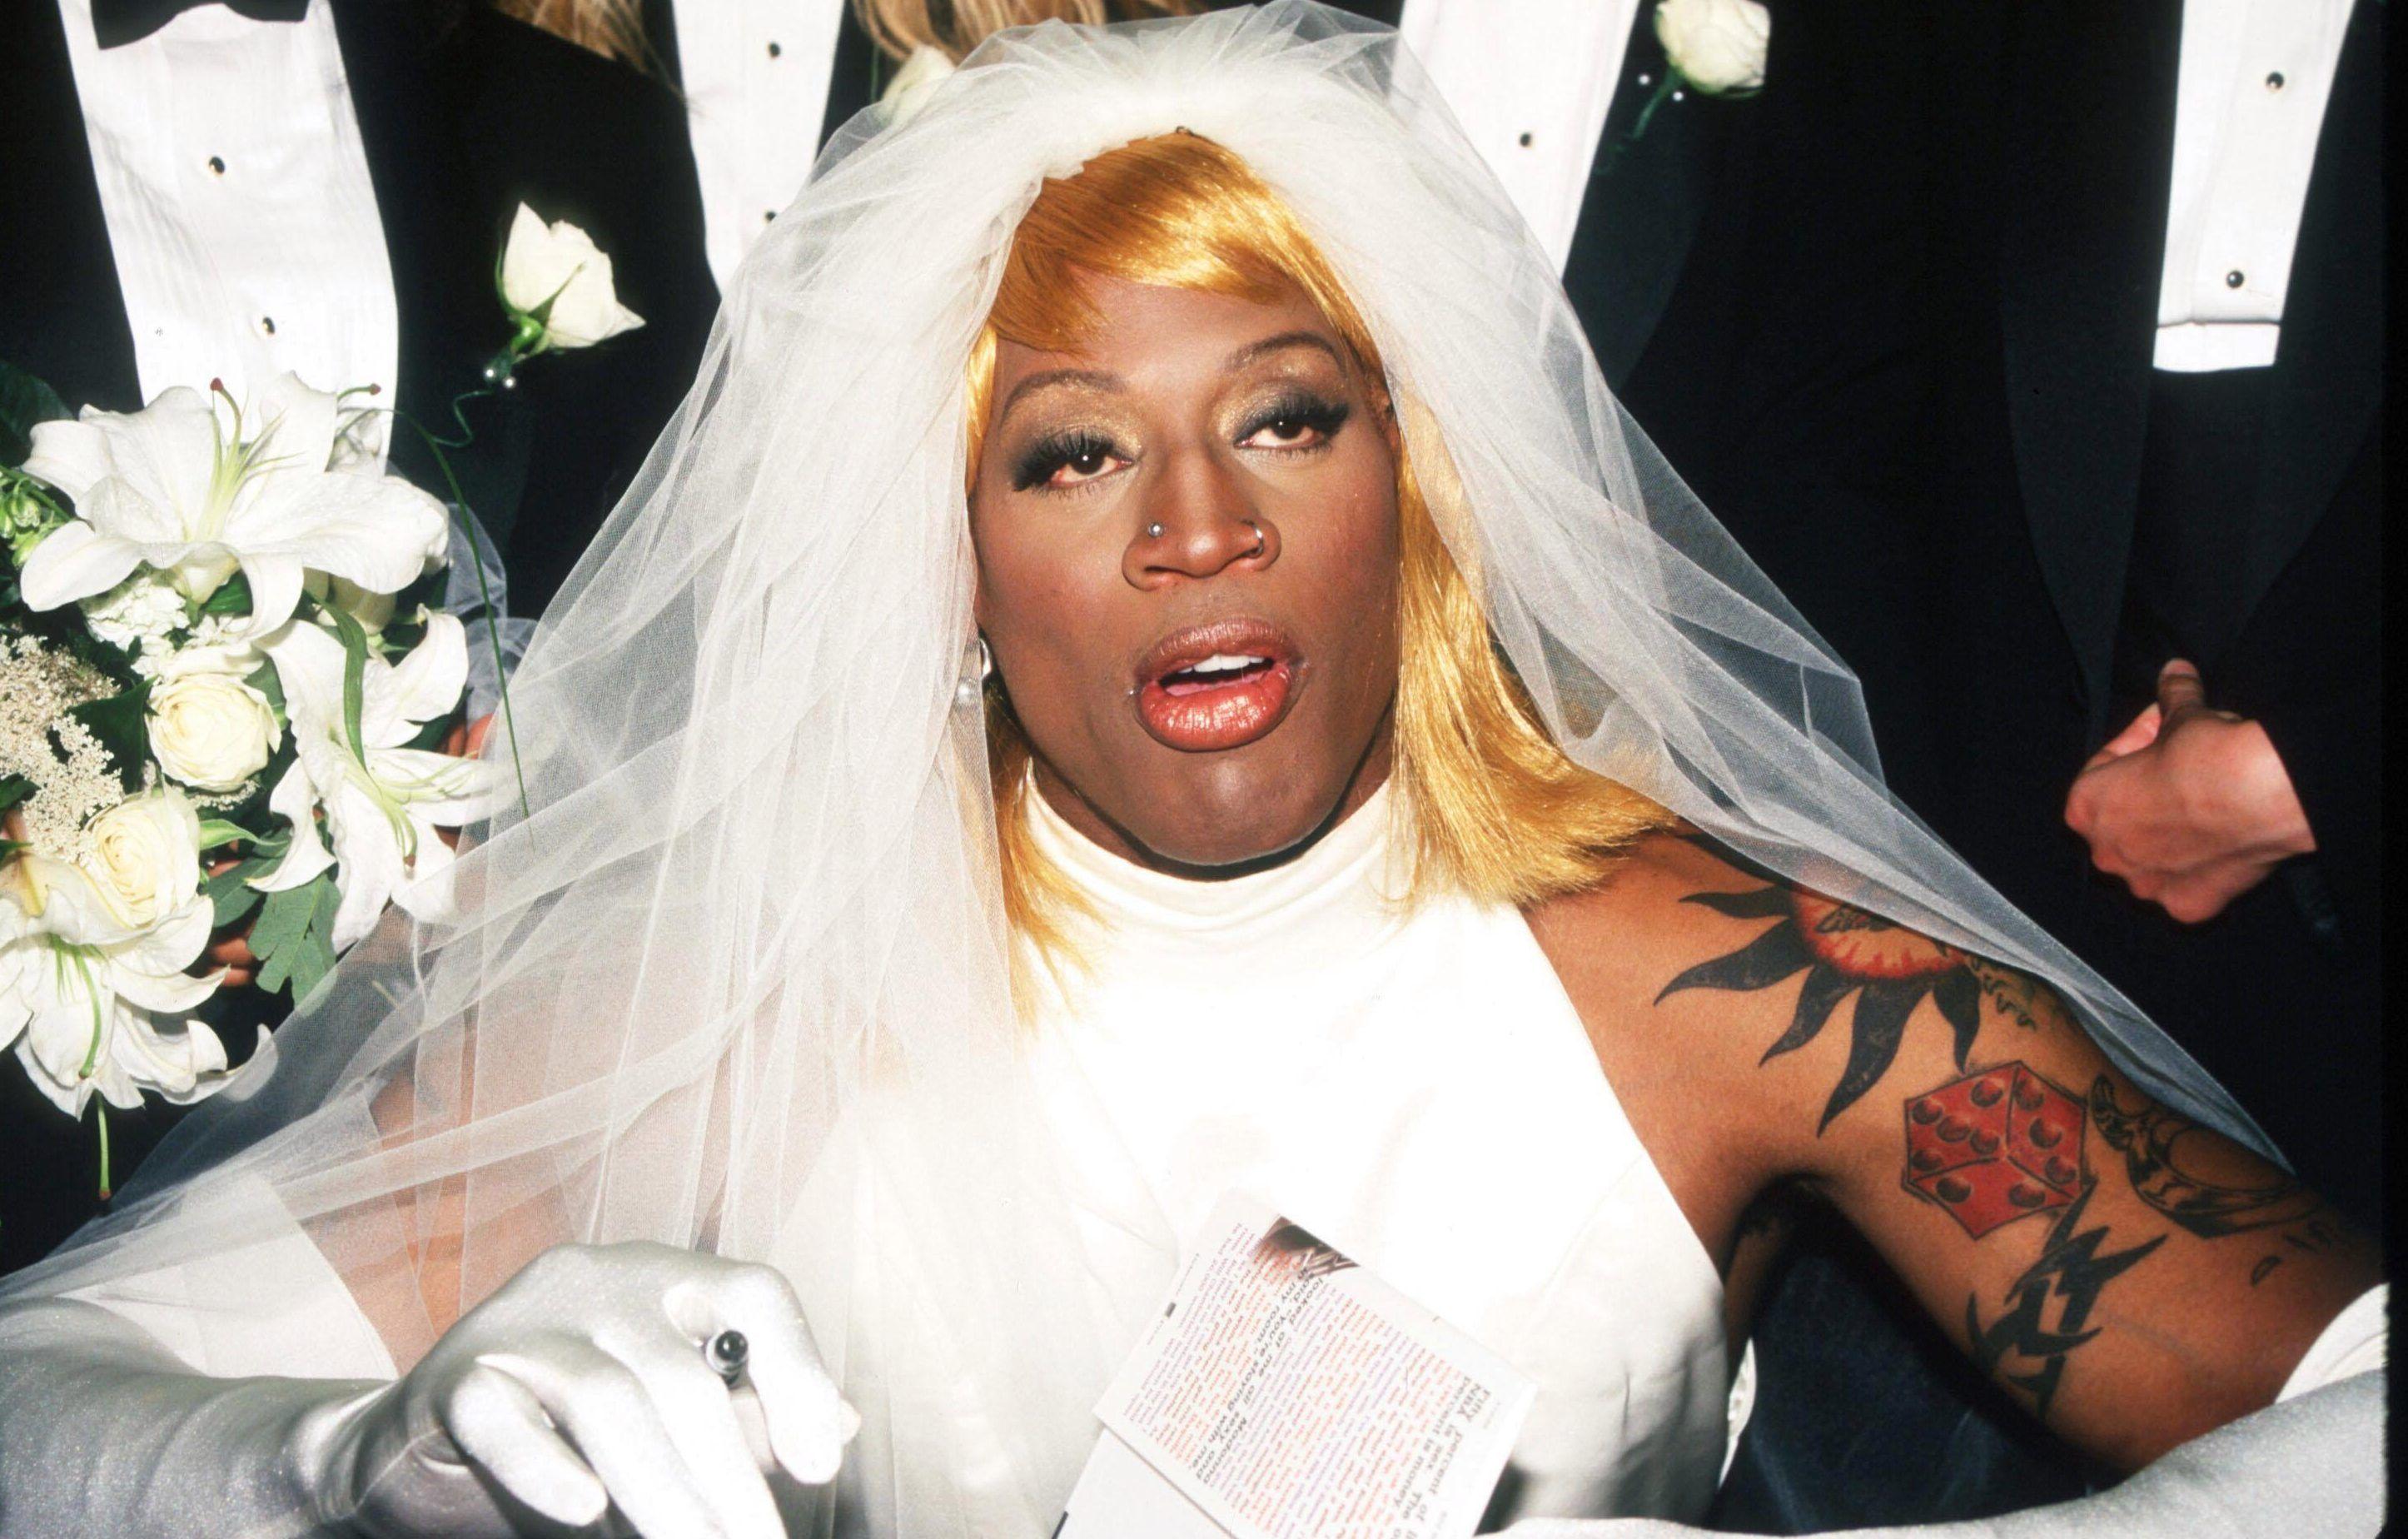 Dennis Rodman Wedding Gown Princess Inside The Crazy World Of Dennis Rodman The Bad Boy O In 2020 Dennis Rodman Wedding Gowns Gowns